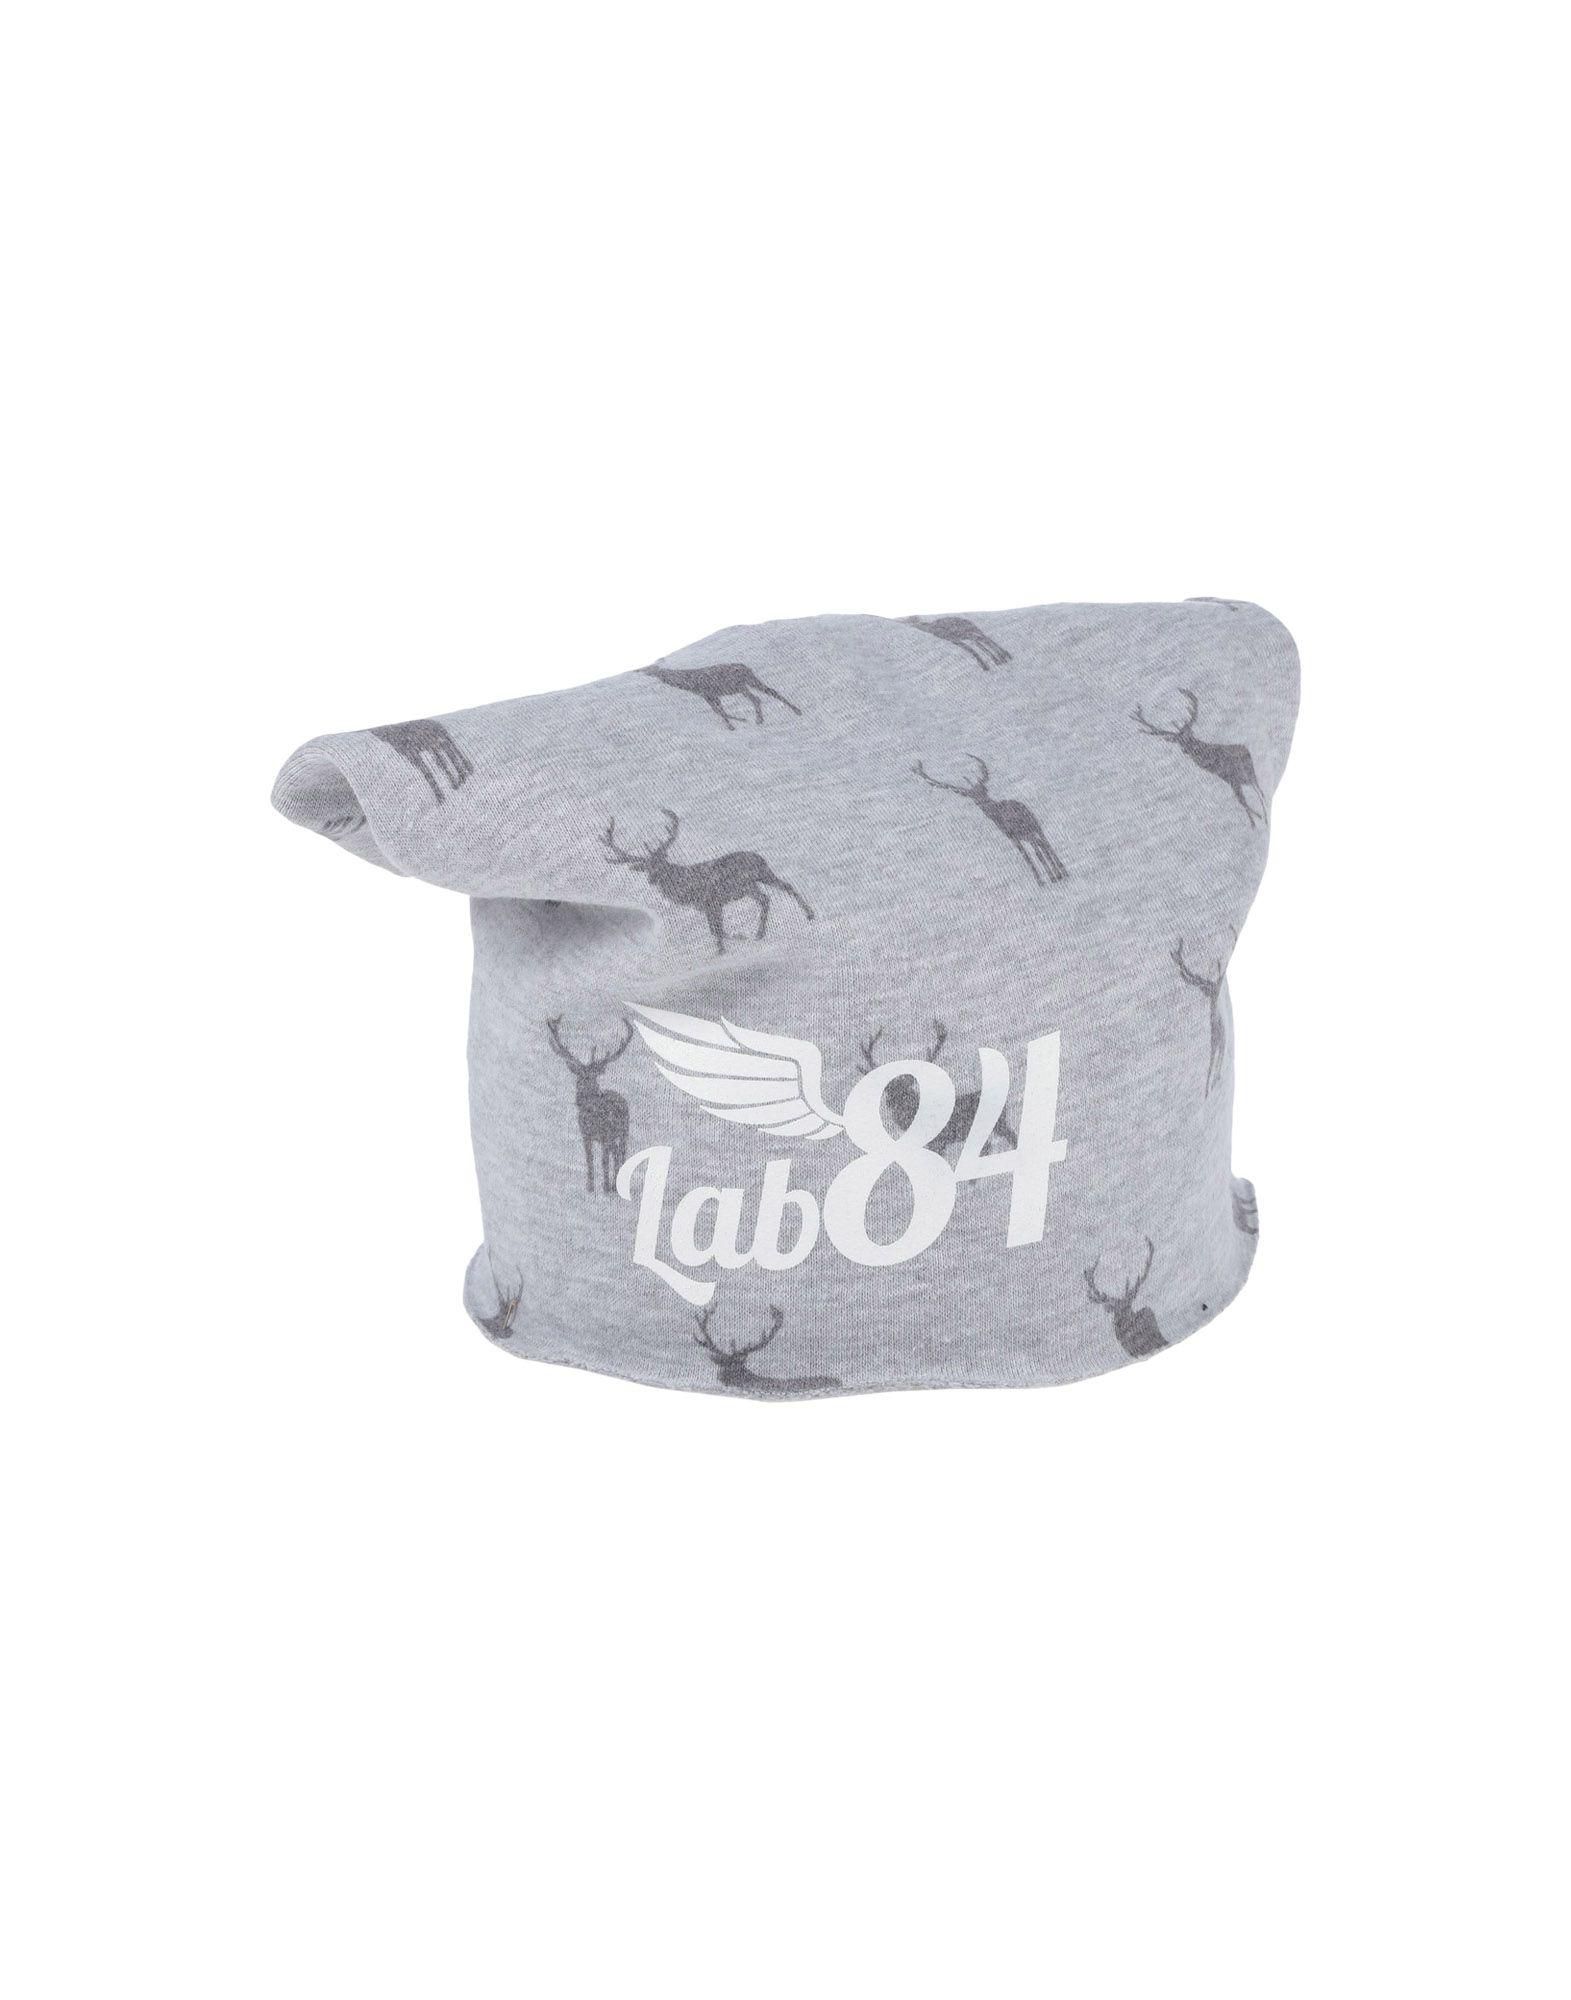 LAB84 Головной убор головной убор ae